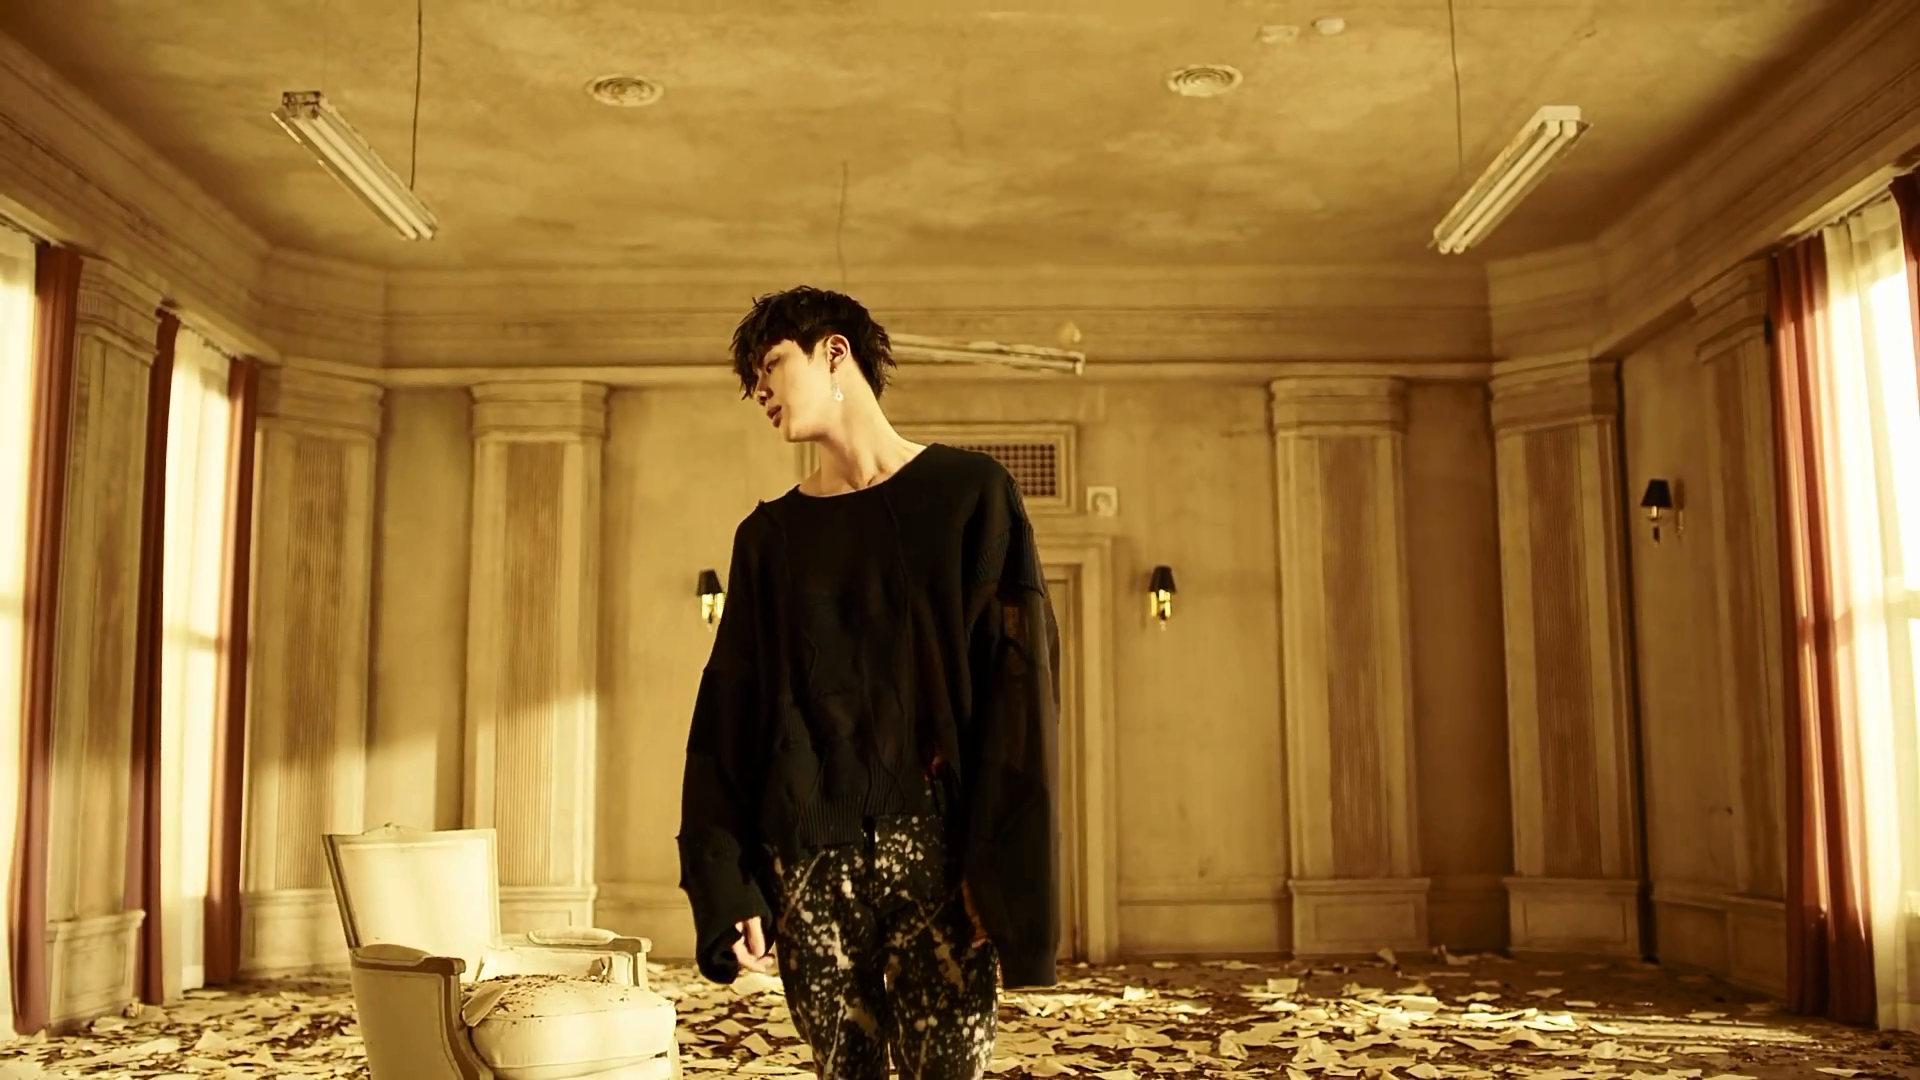 Vixx Wallpaper Hd Bts Fake Love Who S Who K Pop Database Dbkpop Com